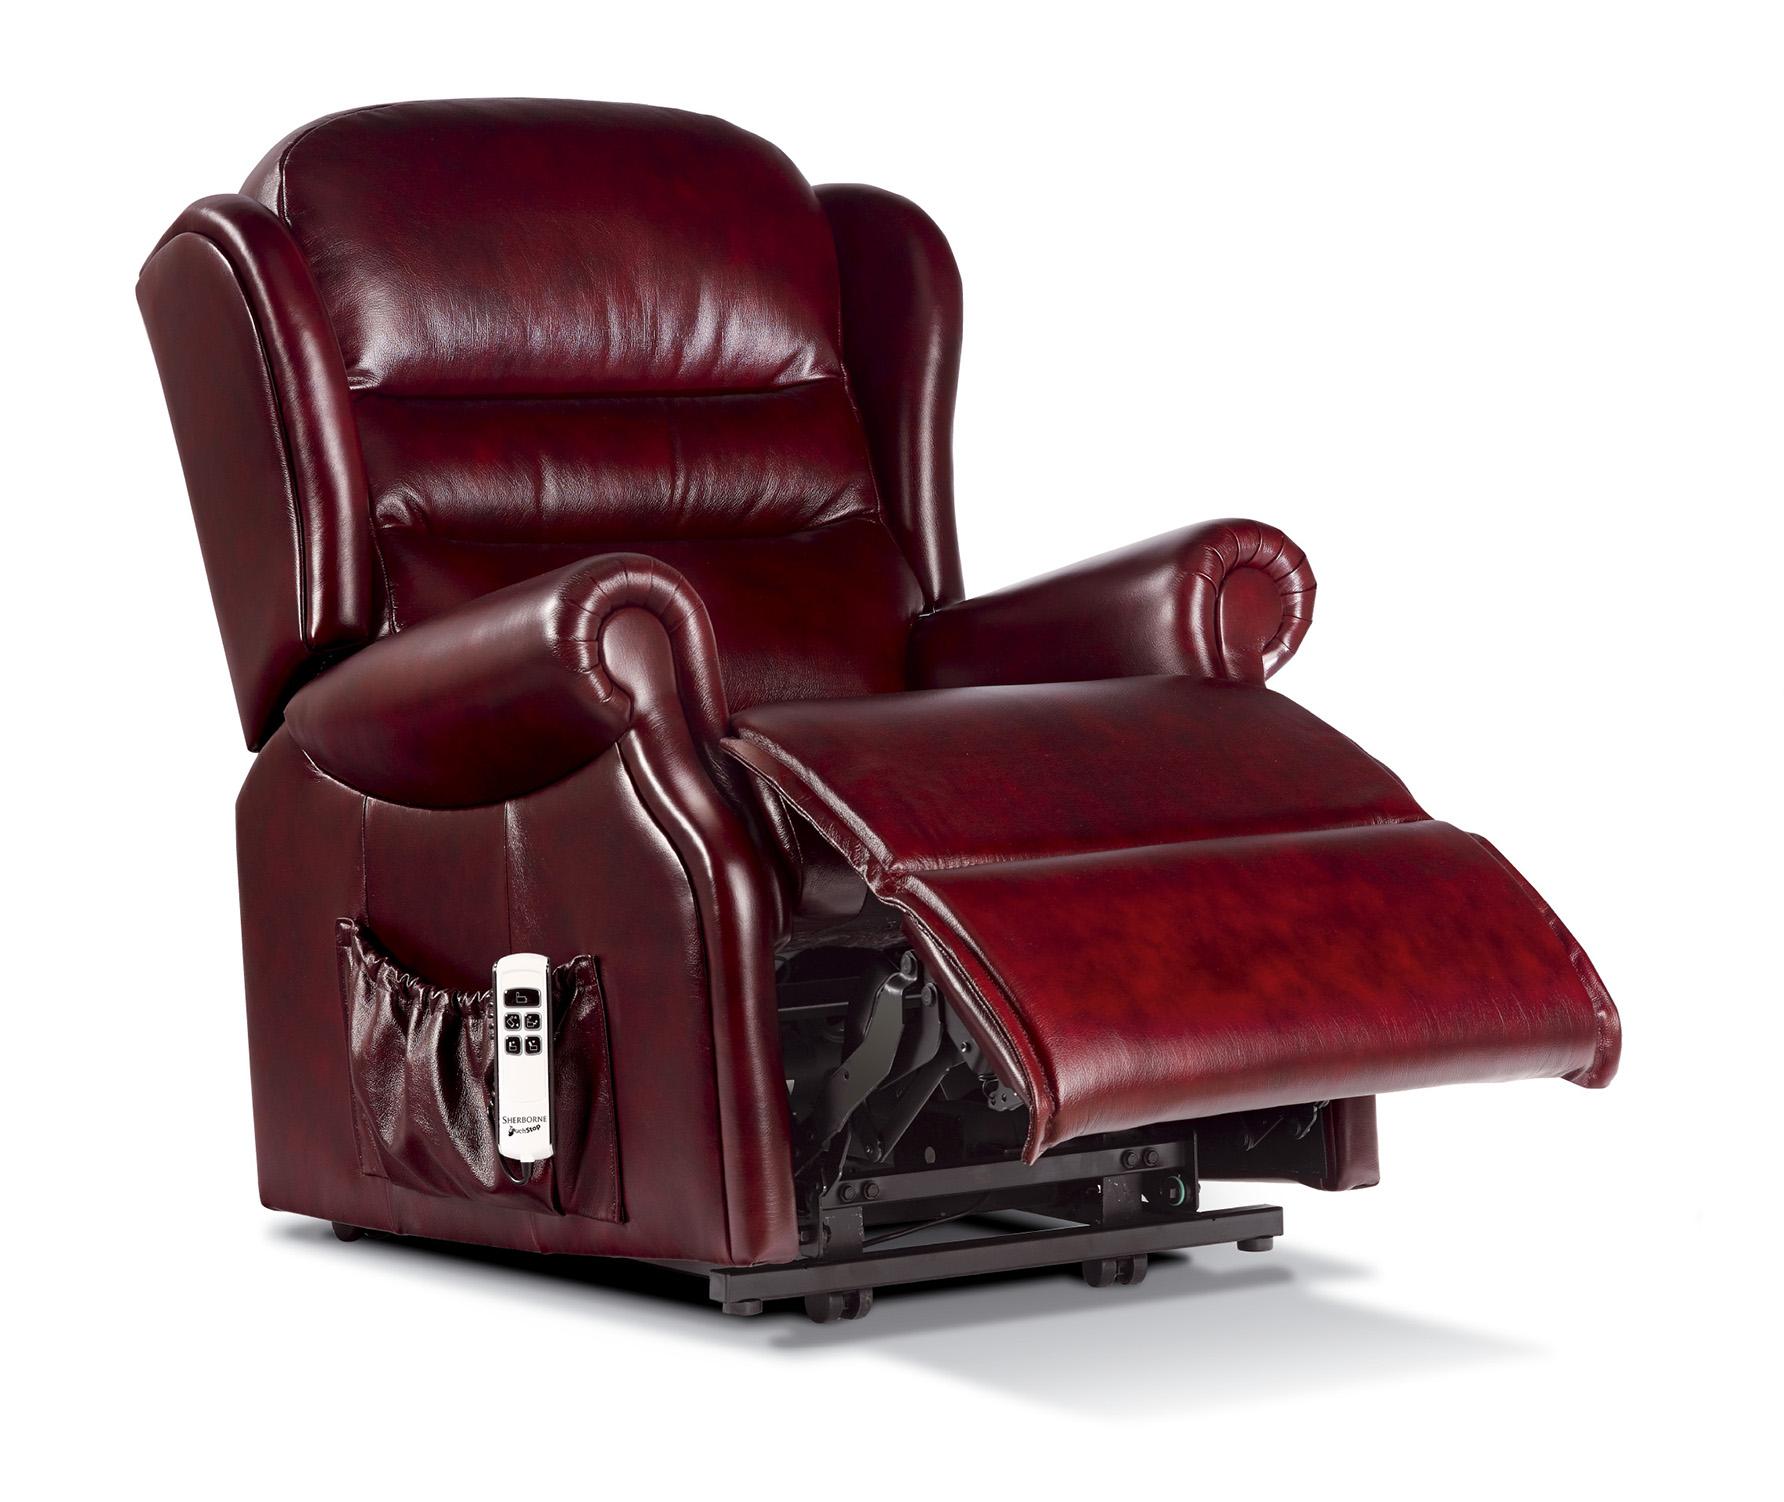 ashford small leather electric riser recliner sherborne. Black Bedroom Furniture Sets. Home Design Ideas